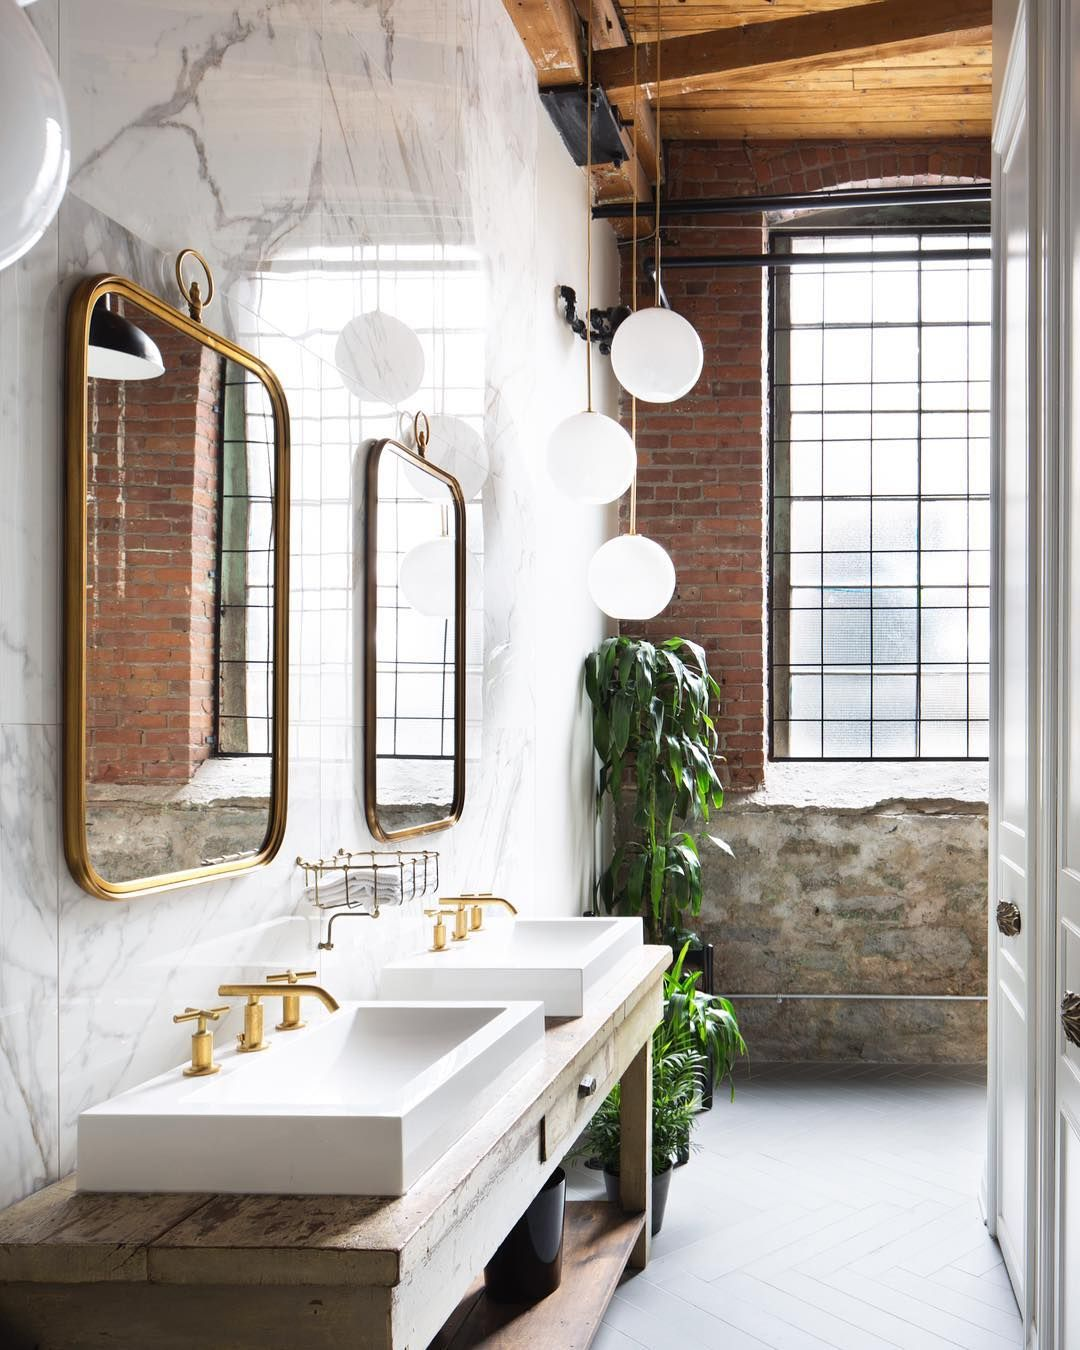 Lachambredesignco Bathroom Decor Amazing Bathrooms Best Bathroom Designs